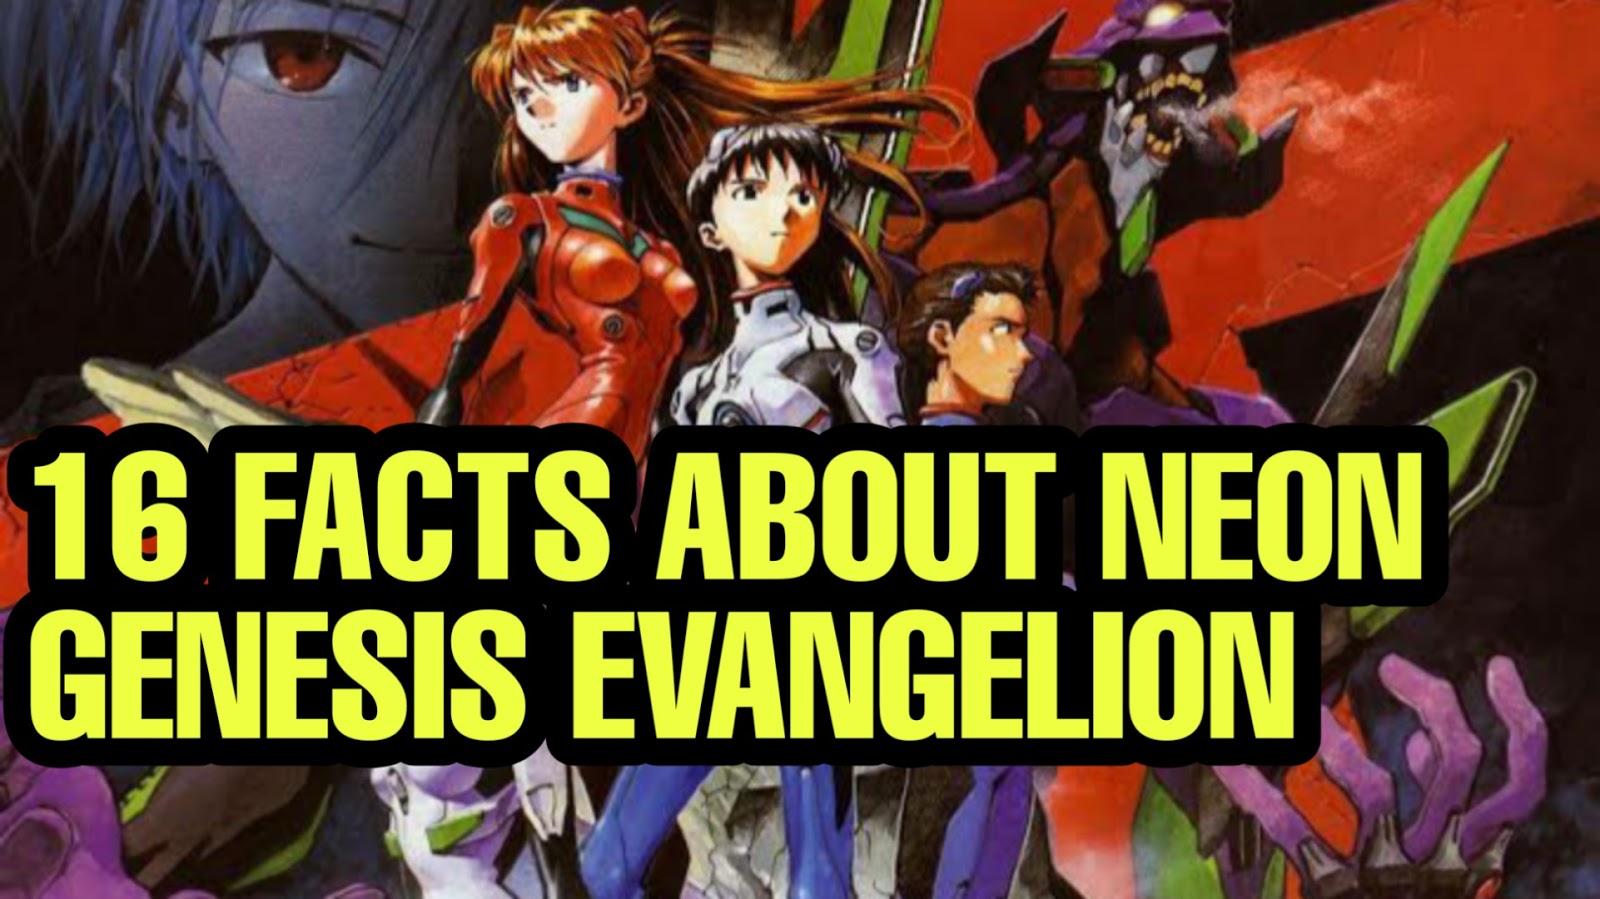 16 FACTS ABOUT NEON GENESIS EVANGELION